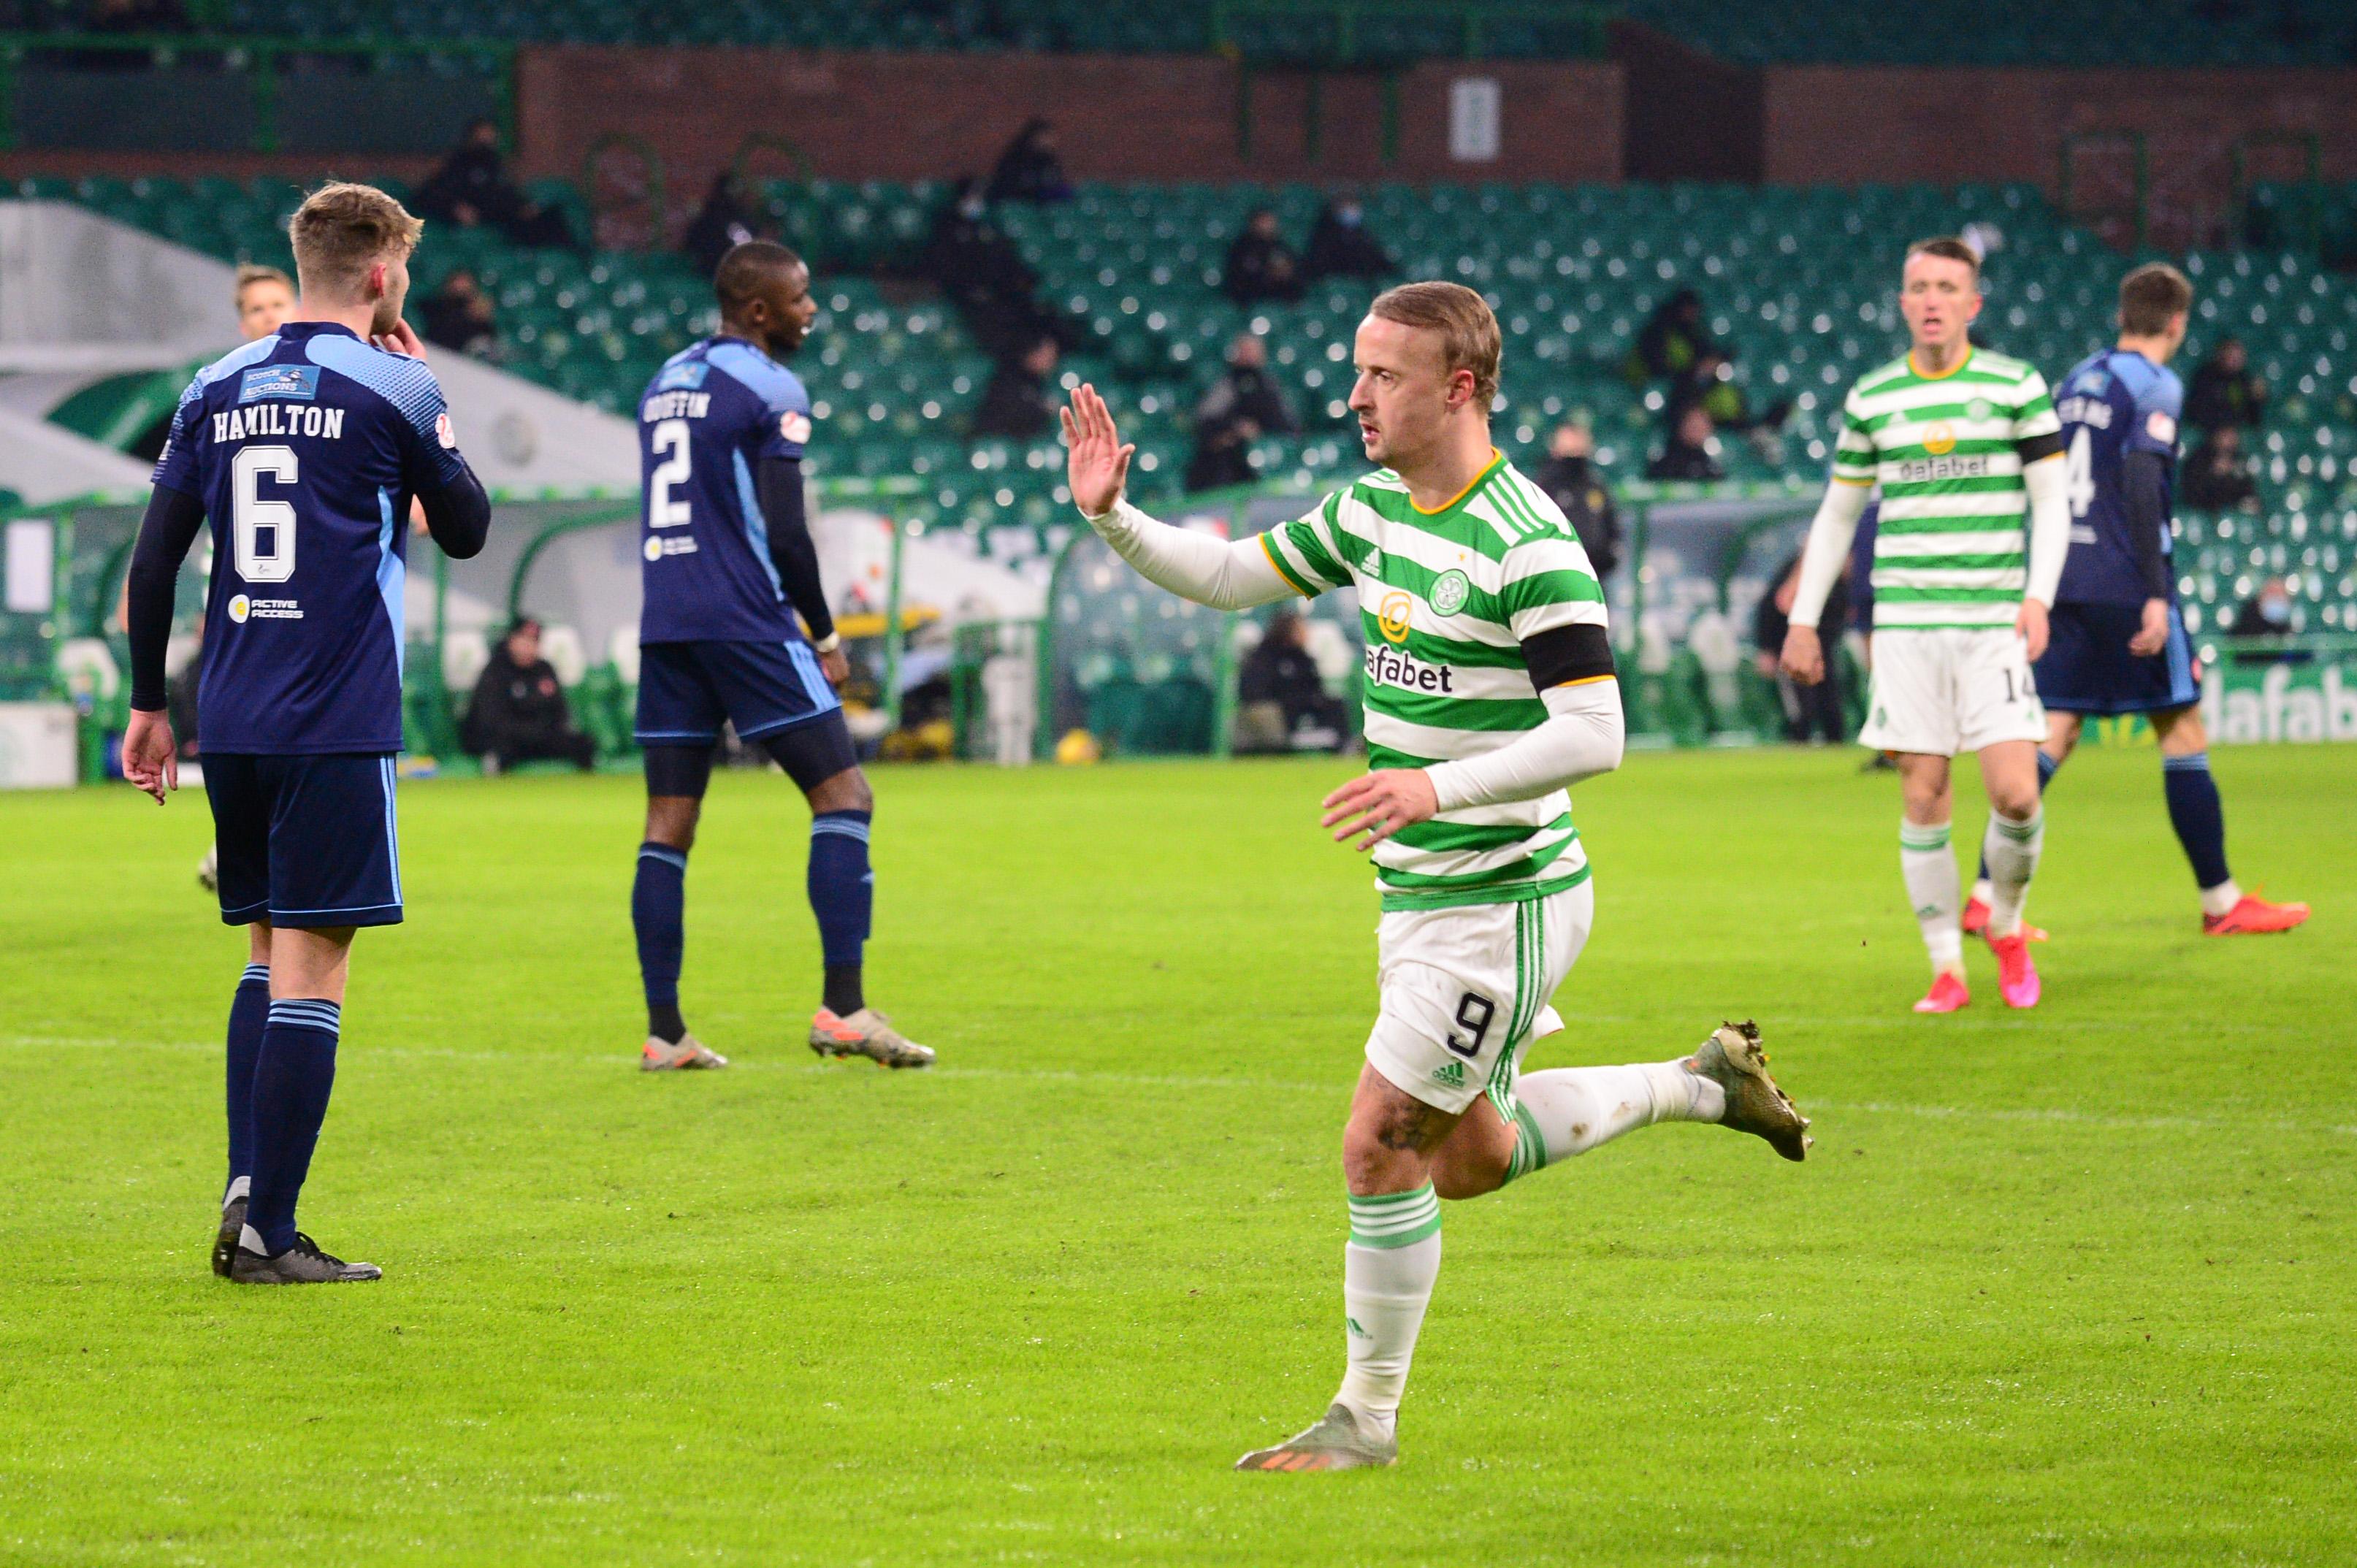 Celtic v Hamilton Academical - Ladbrokes Scottish Premiership